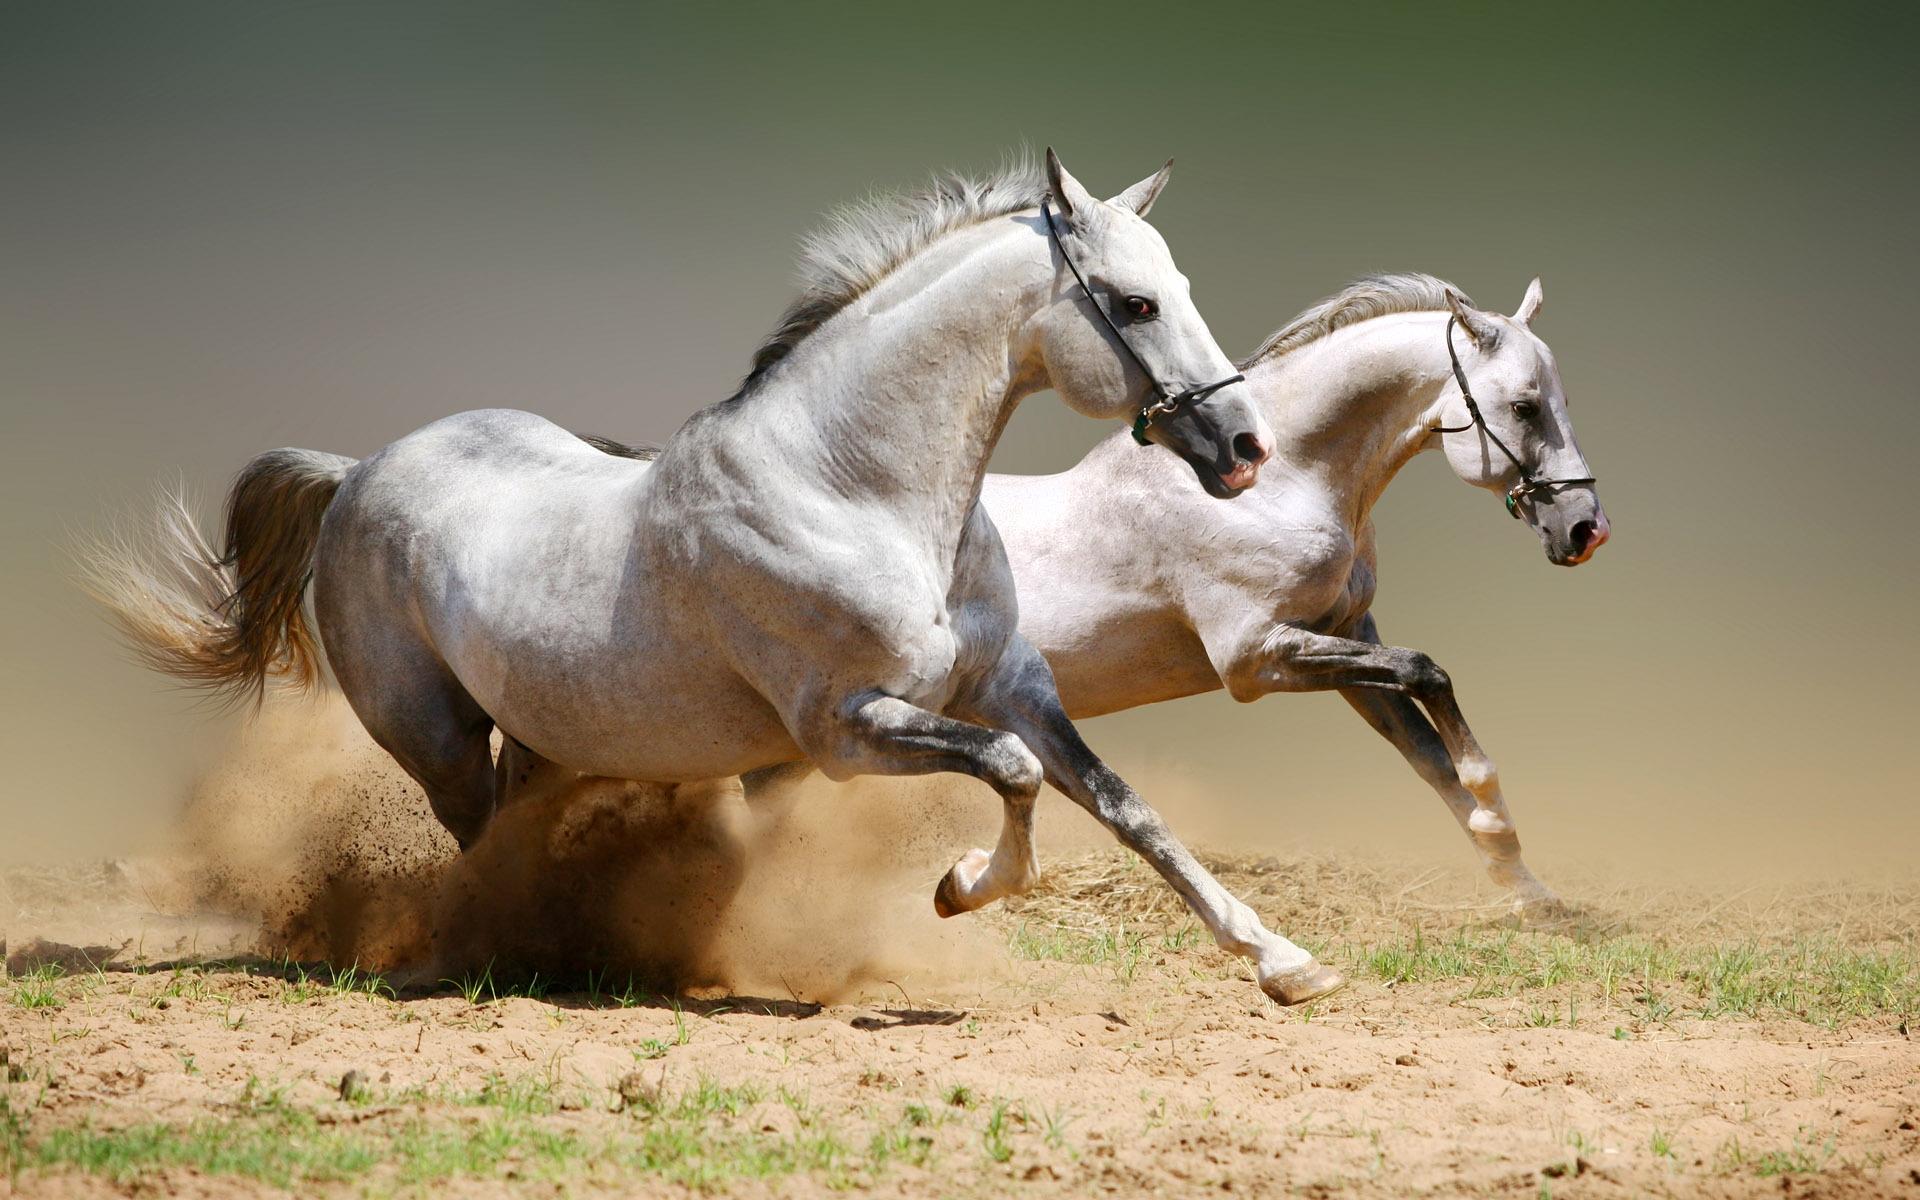 white horse wallpaper 25694 1920x1200 px ~ hdwallsource